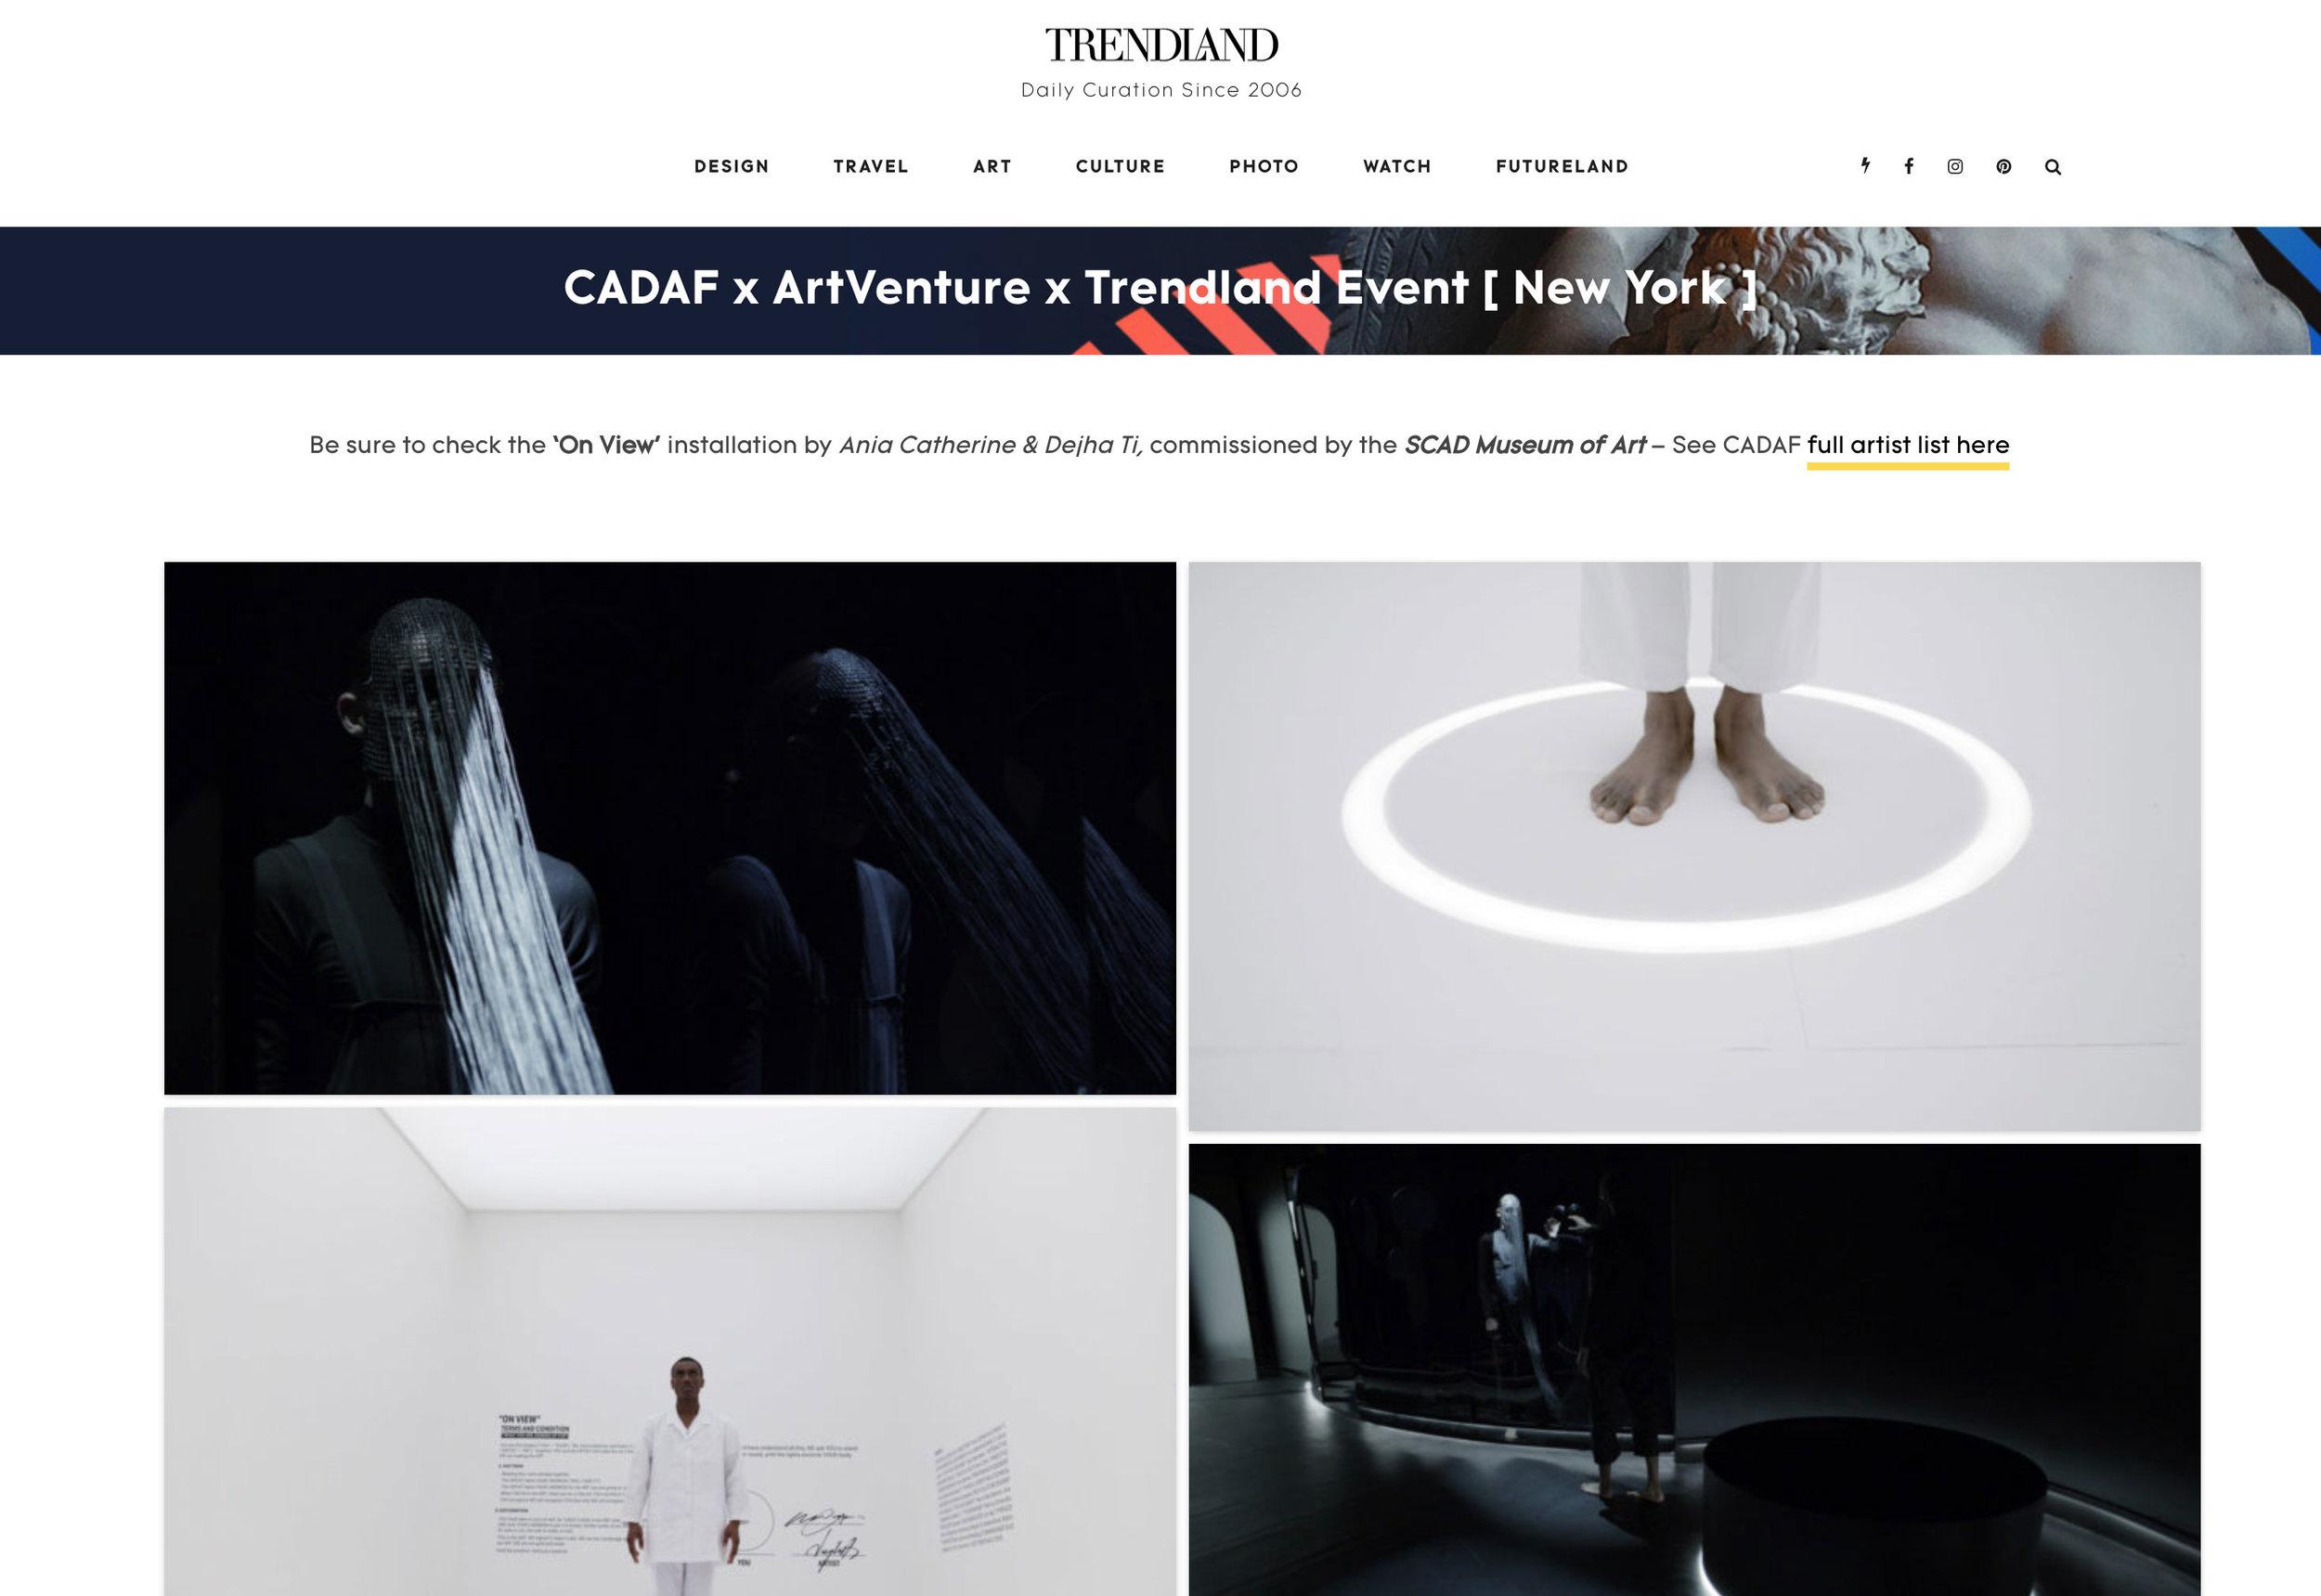 trendland-artventure-cadaf-dejhati-aniacatherine-onview.jpg